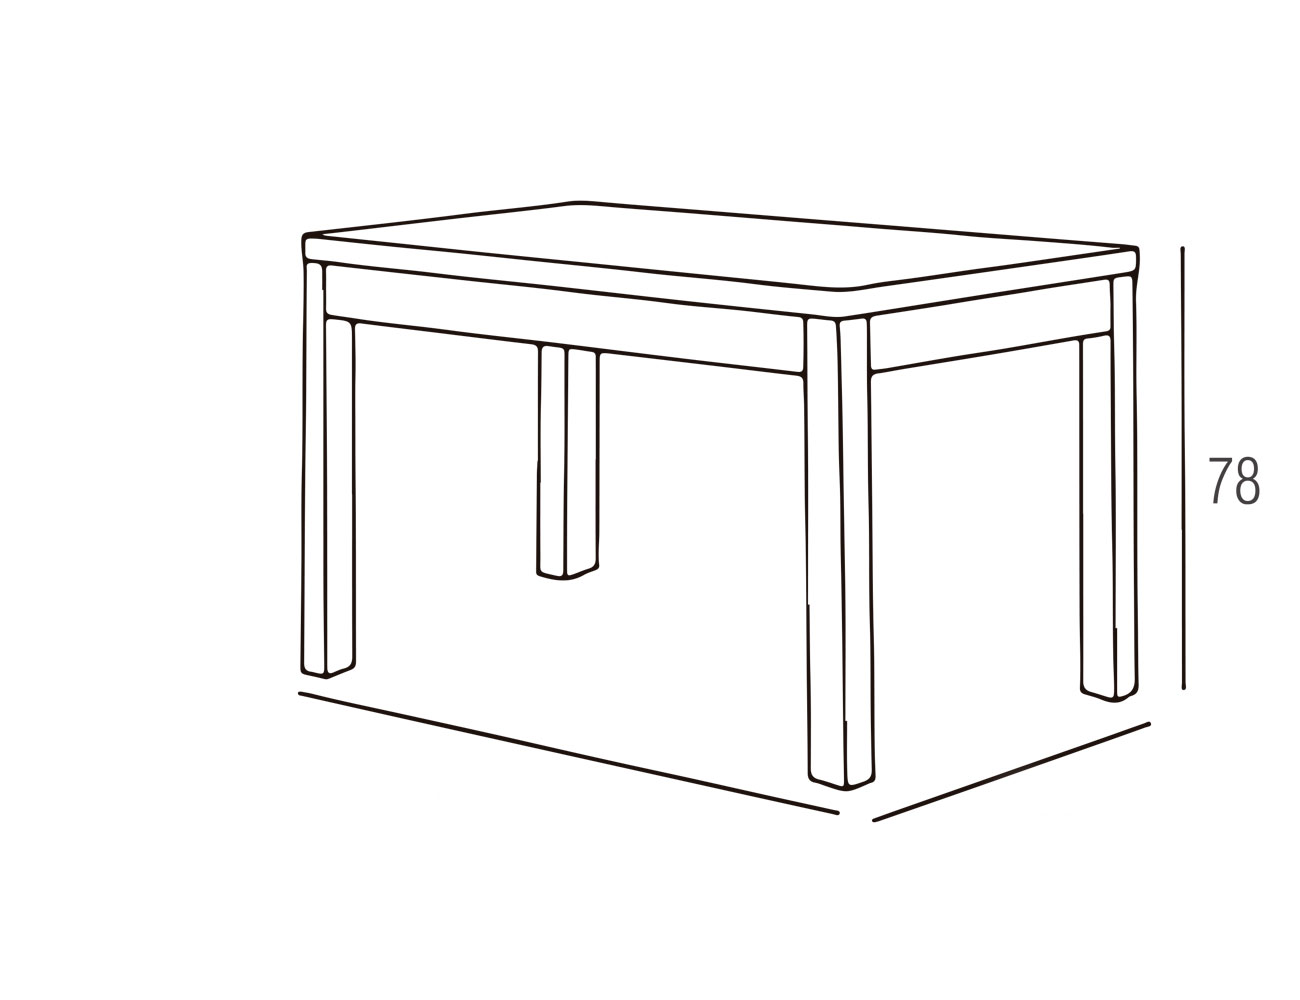 Mesa fija 120x80 praga